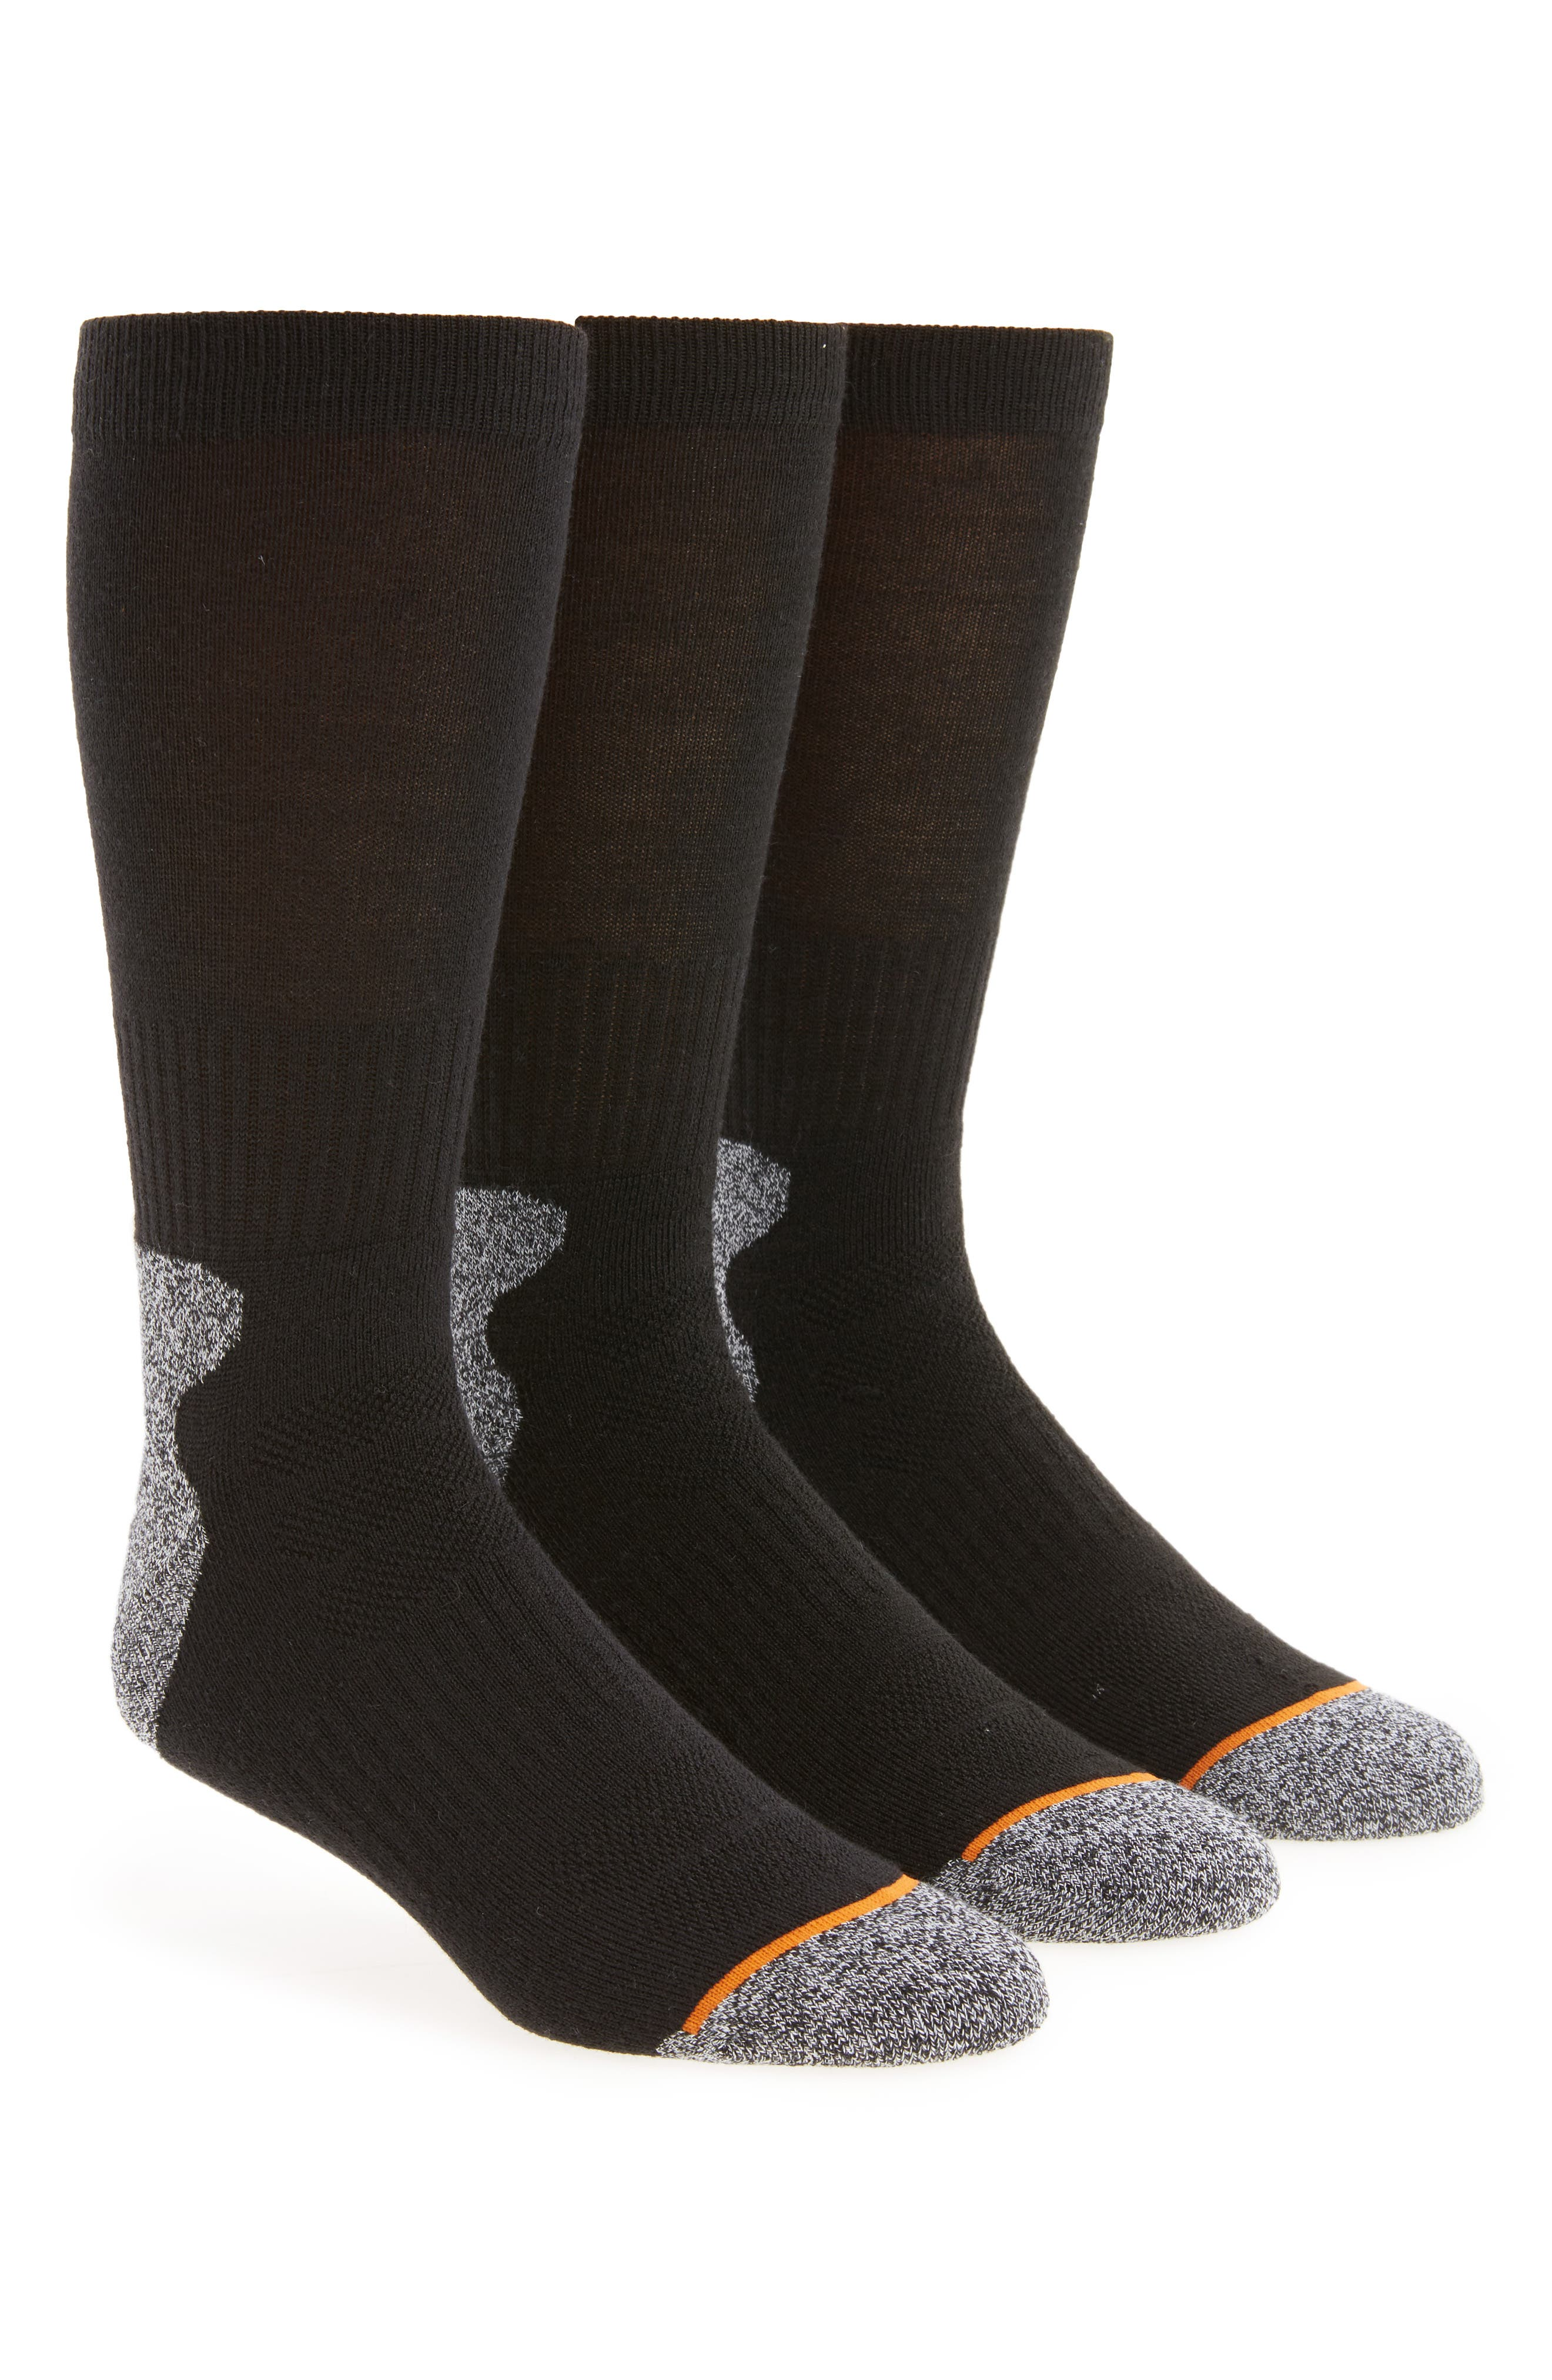 3-Pack Assorted Boot Socks,                             Main thumbnail 1, color,                             Black